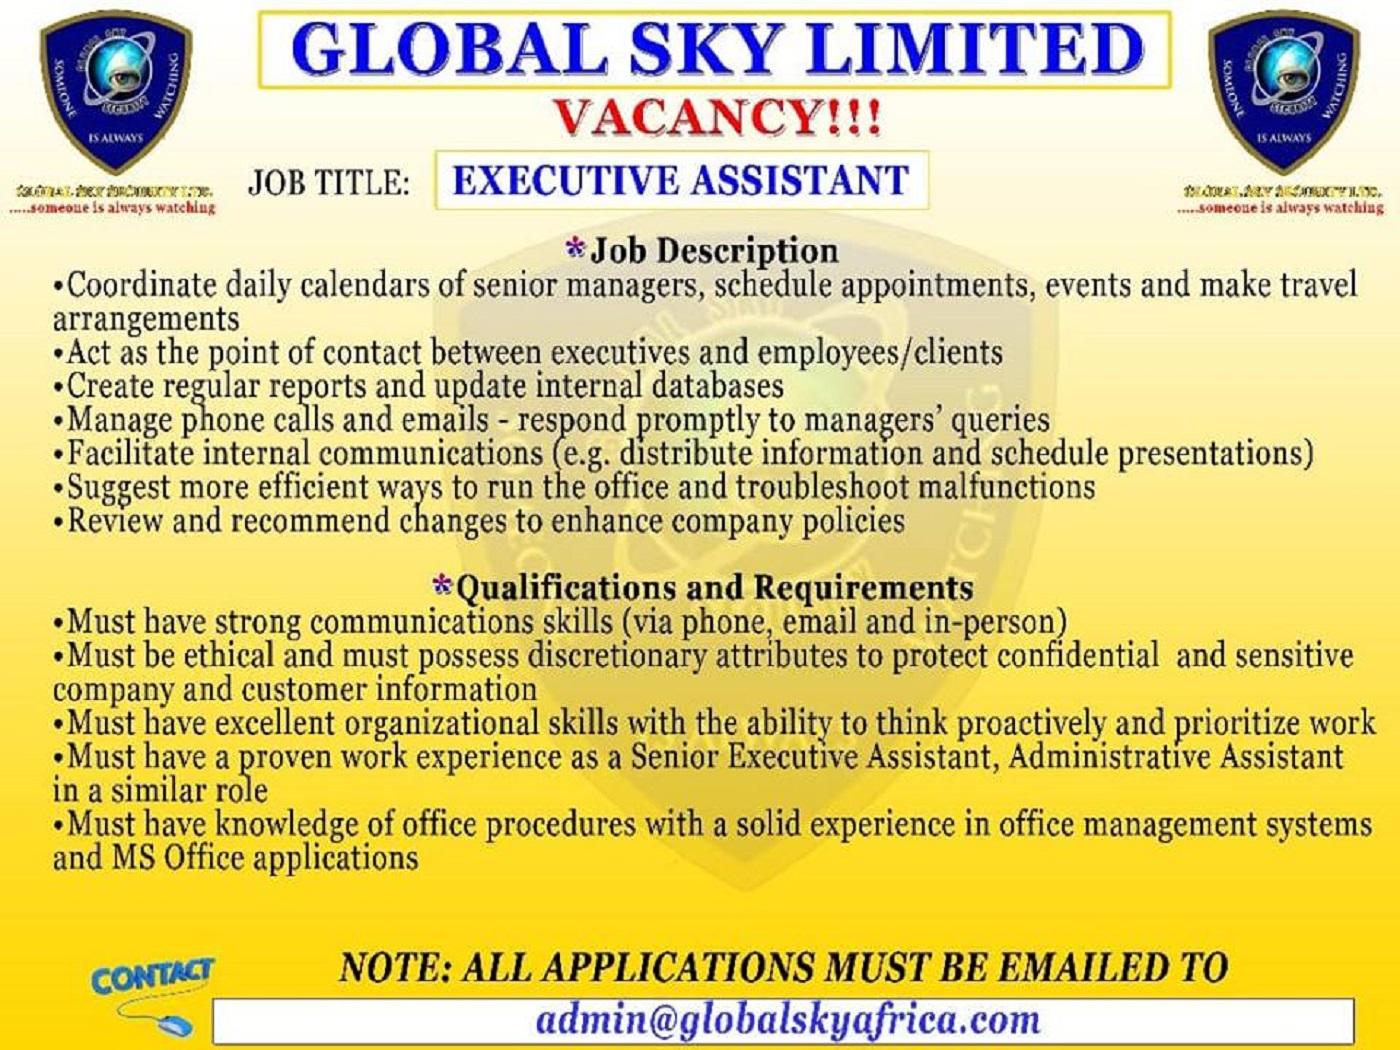 JOB VACANCIES, APPLY NOW!!! - Globalskyafricaonline com